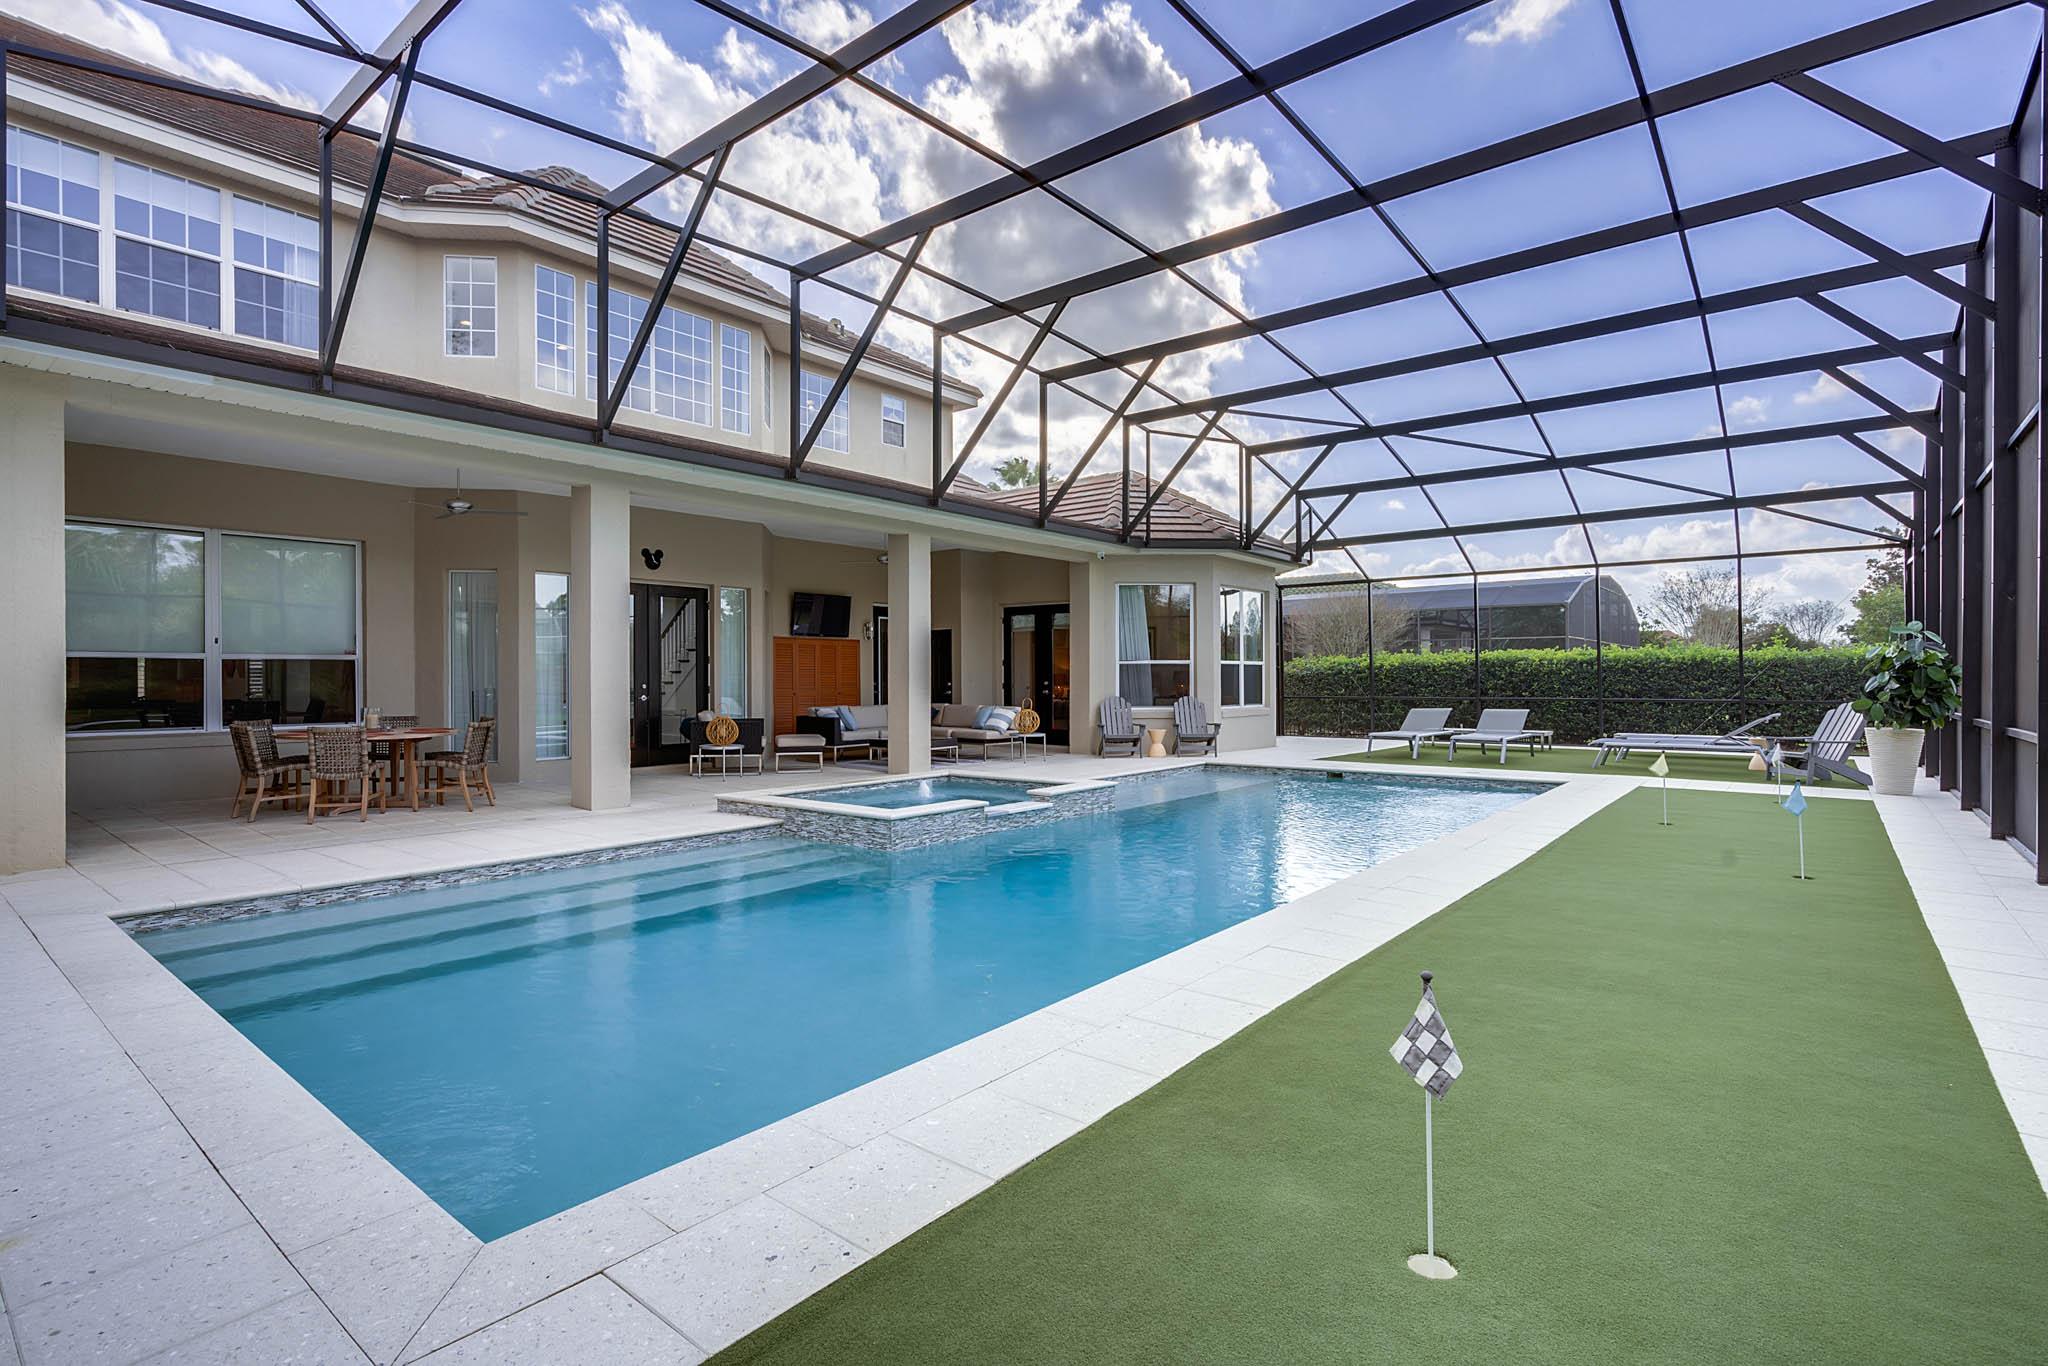 10514 Emerald Chase Drive Orlando Fl 32836 - 07 - Pool.jpg